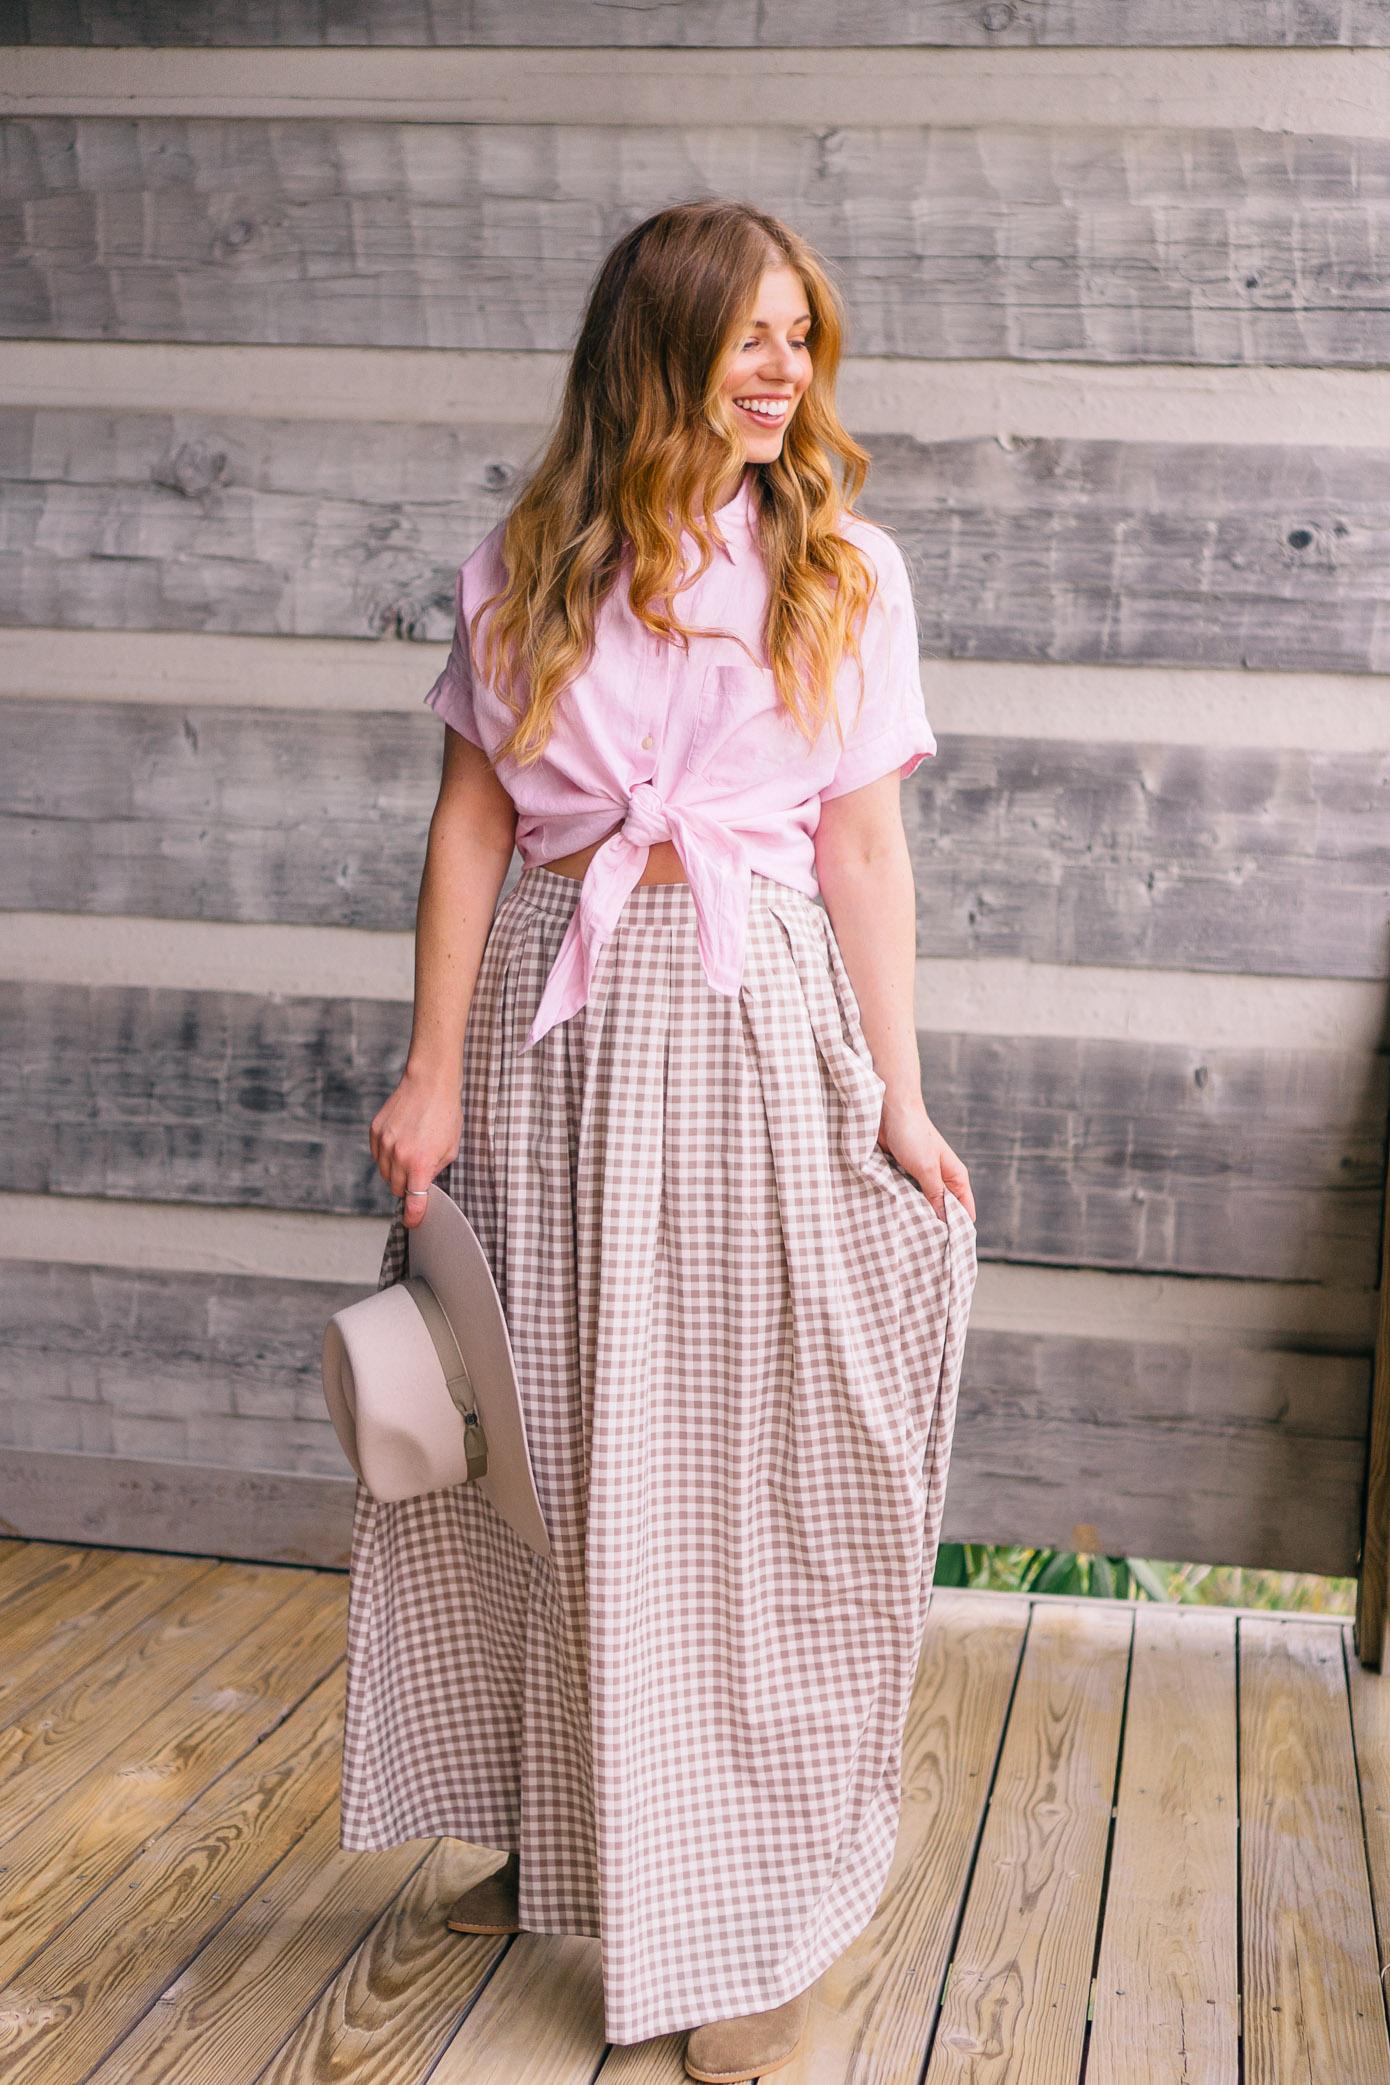 Three Skirts Styled Three Ways | Summer Capsule Wardrobe | Louella Reese Life & Style Blog